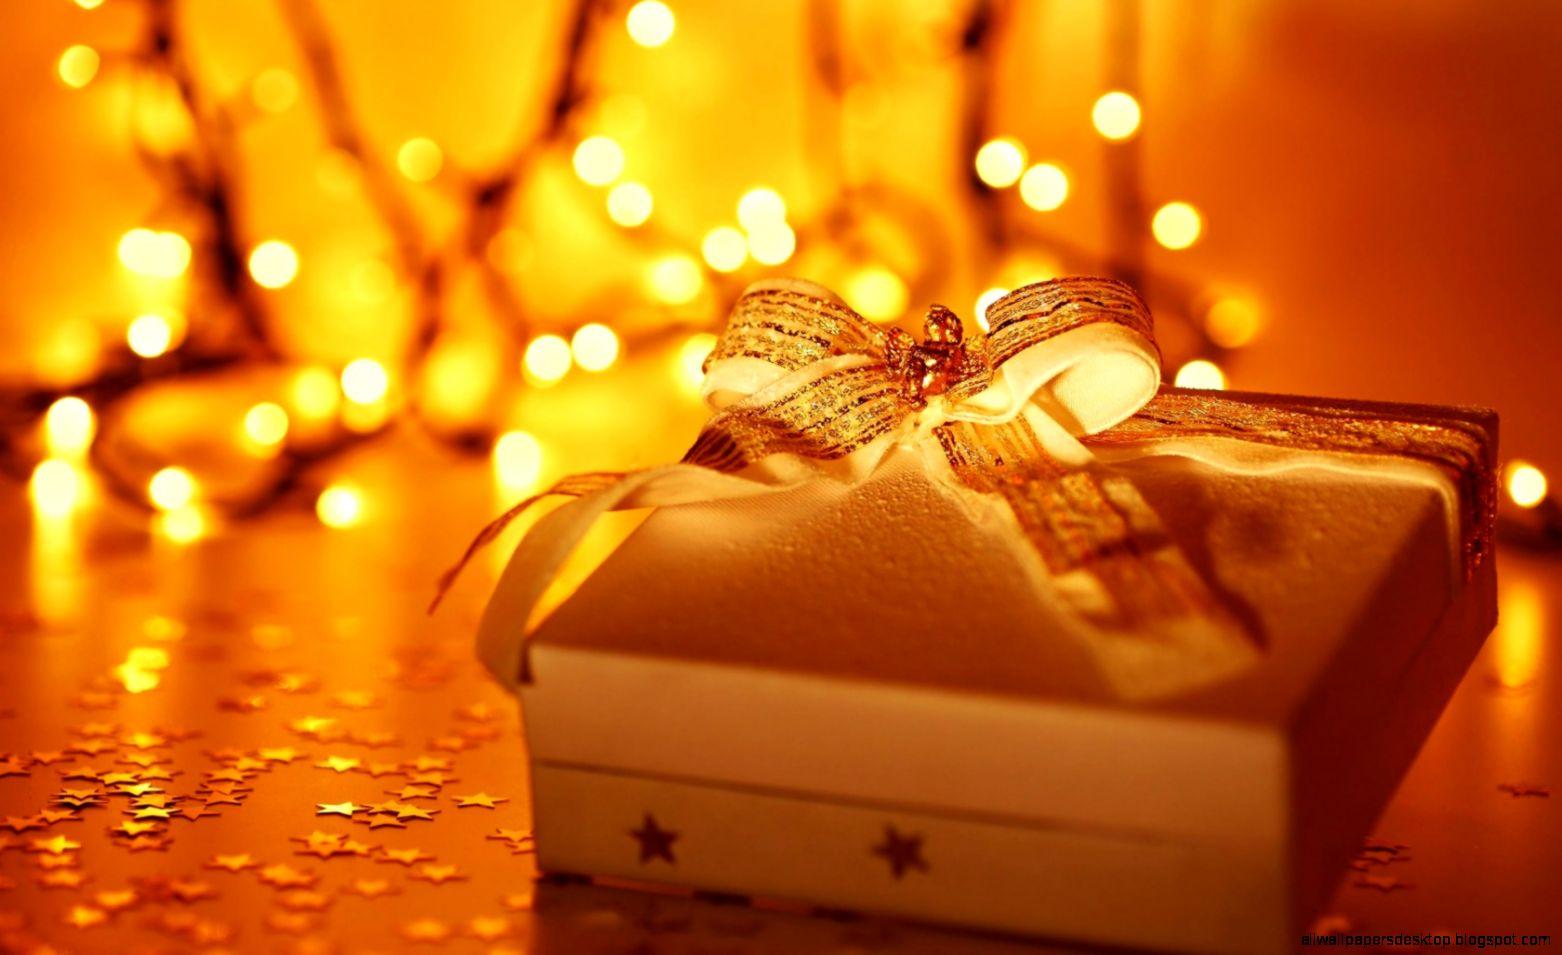 Holiday Gift Box New Year Christmas Lights wallpaper  1680x1050